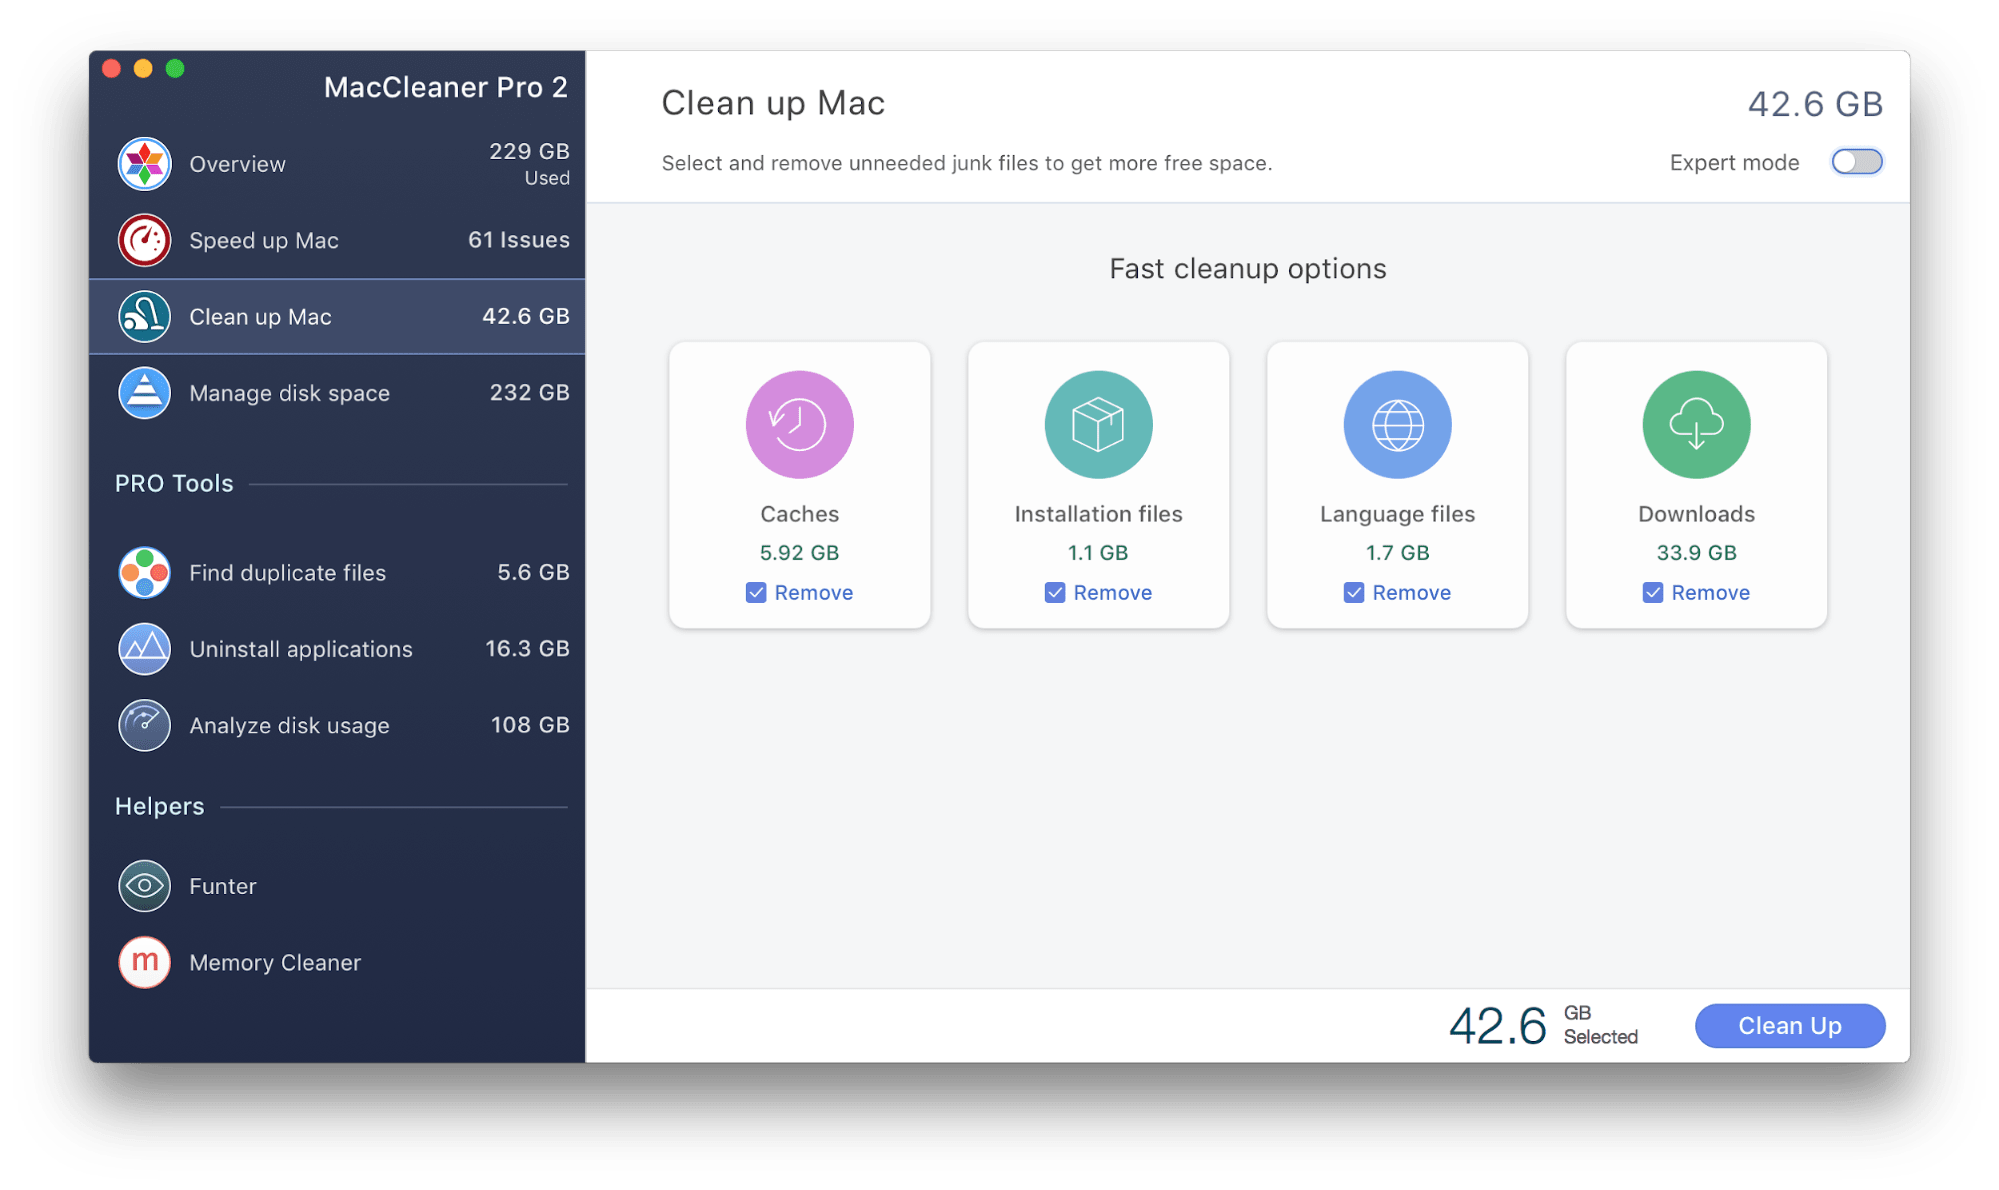 Clean up Mac tab in MacCleaner Pro window